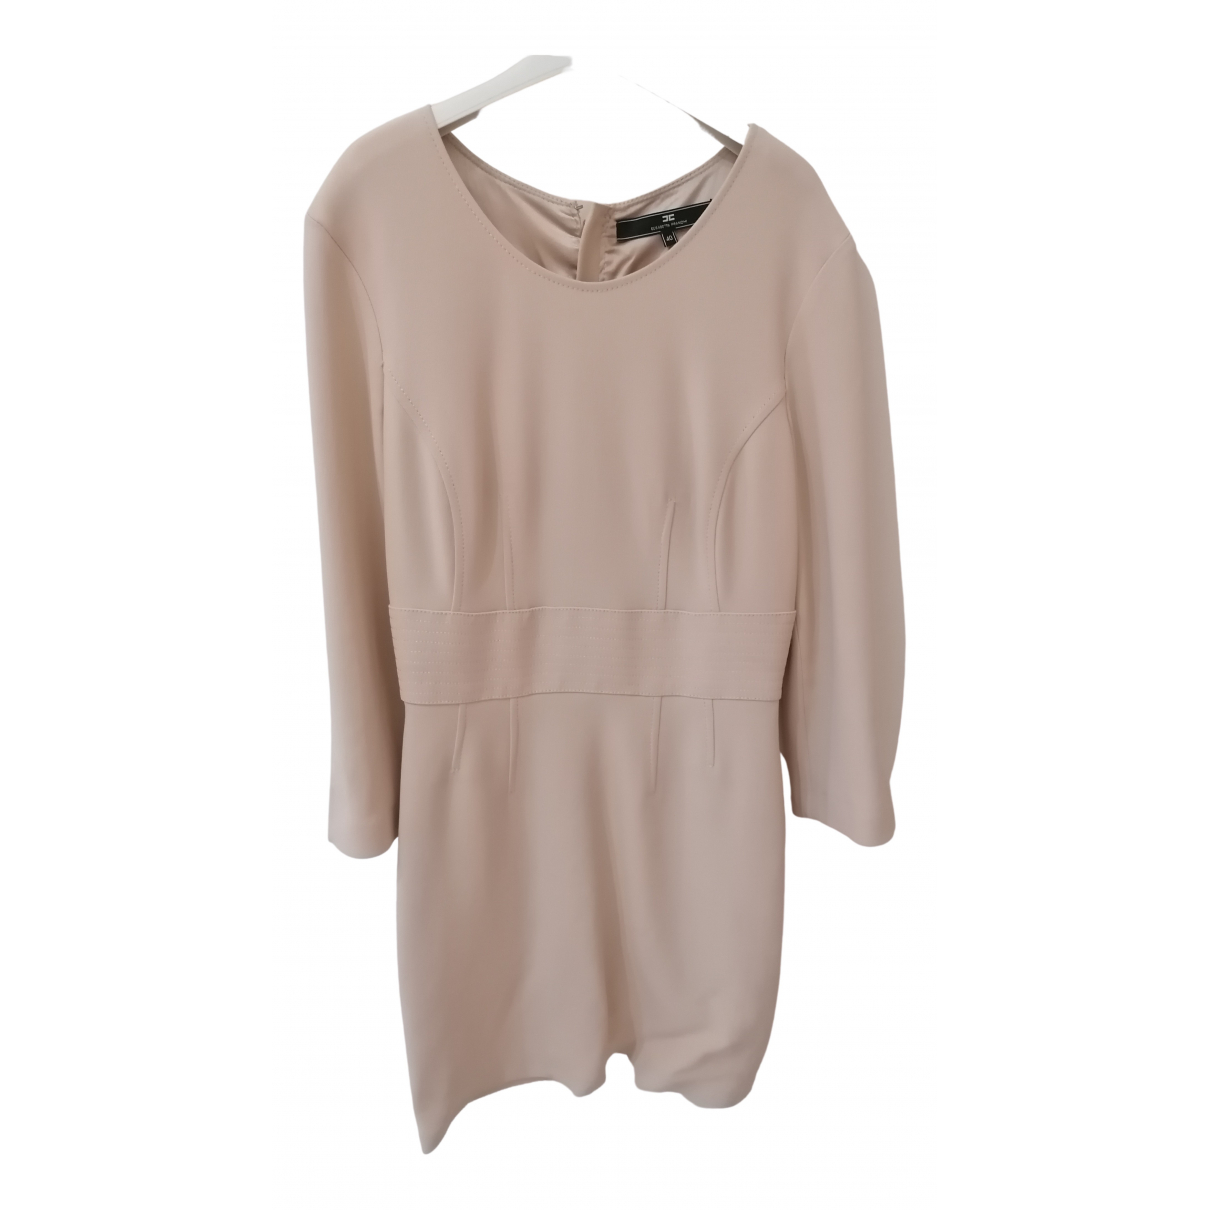 Elisabetta Franchi \N Beige Cotton - elasthane dress for Women 40 IT